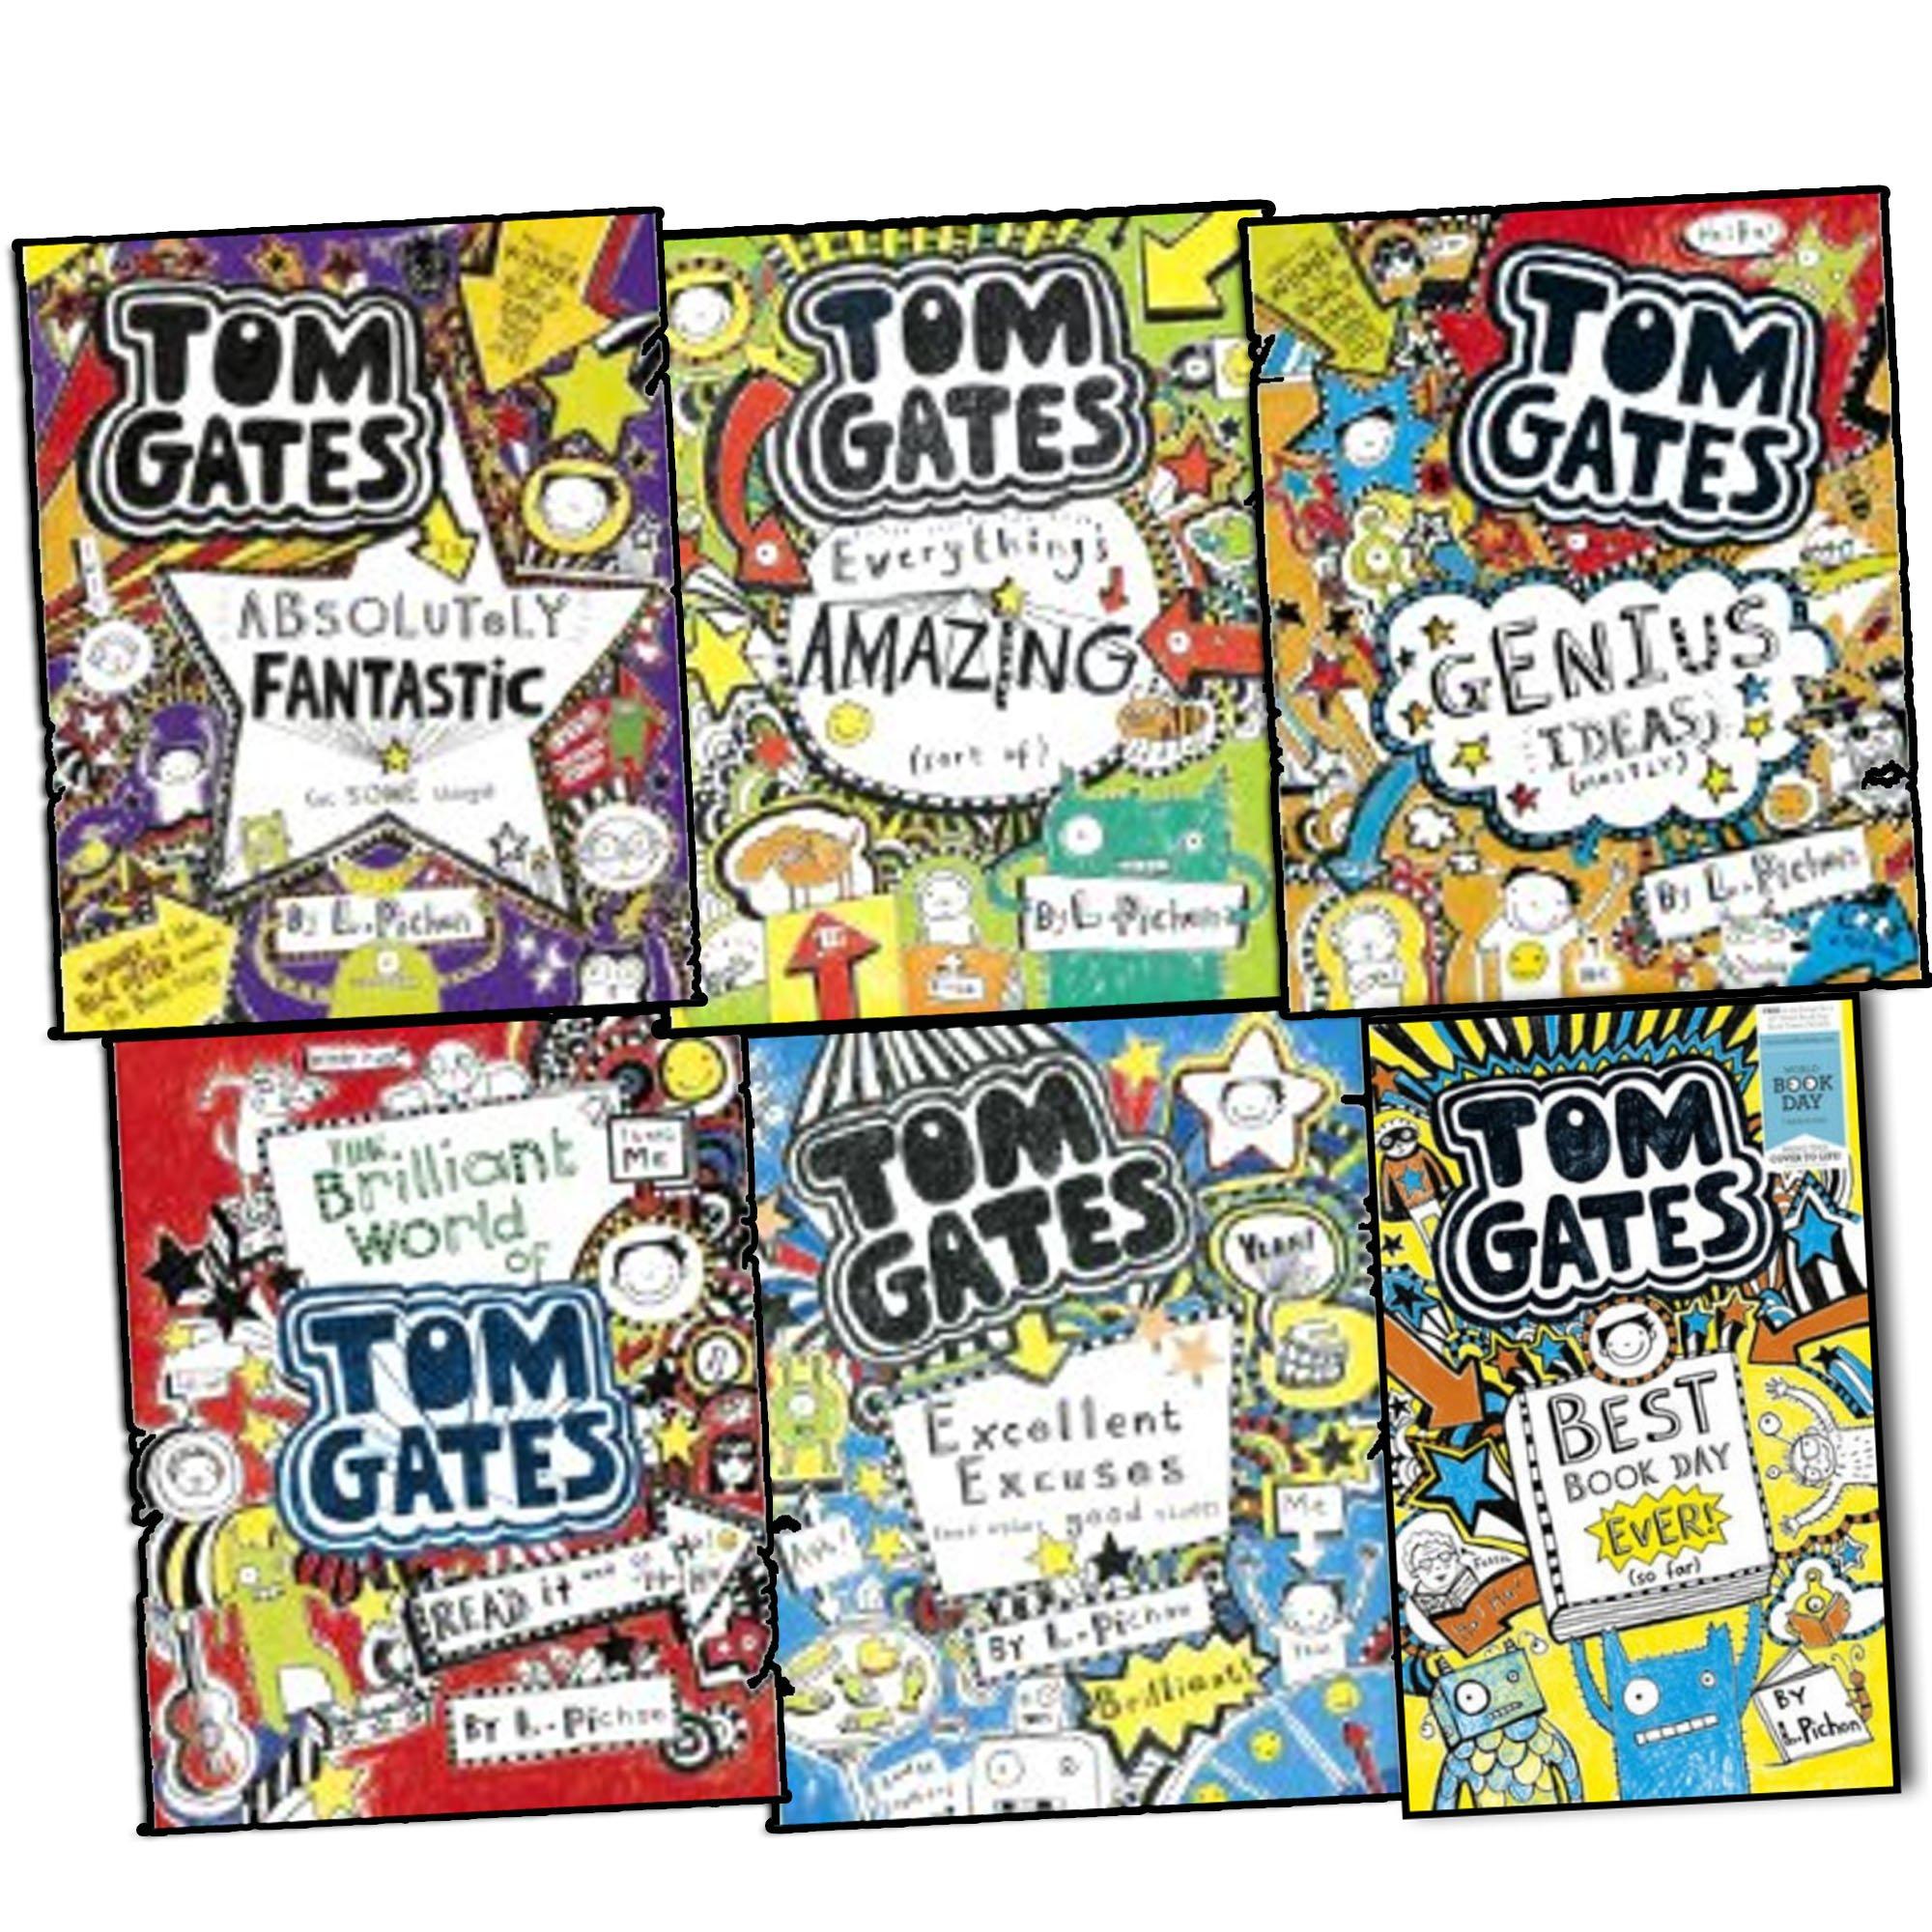 Liz Pichon Tom Gates 6 Books Collection Set Pack RRP 35.95 Genius ...